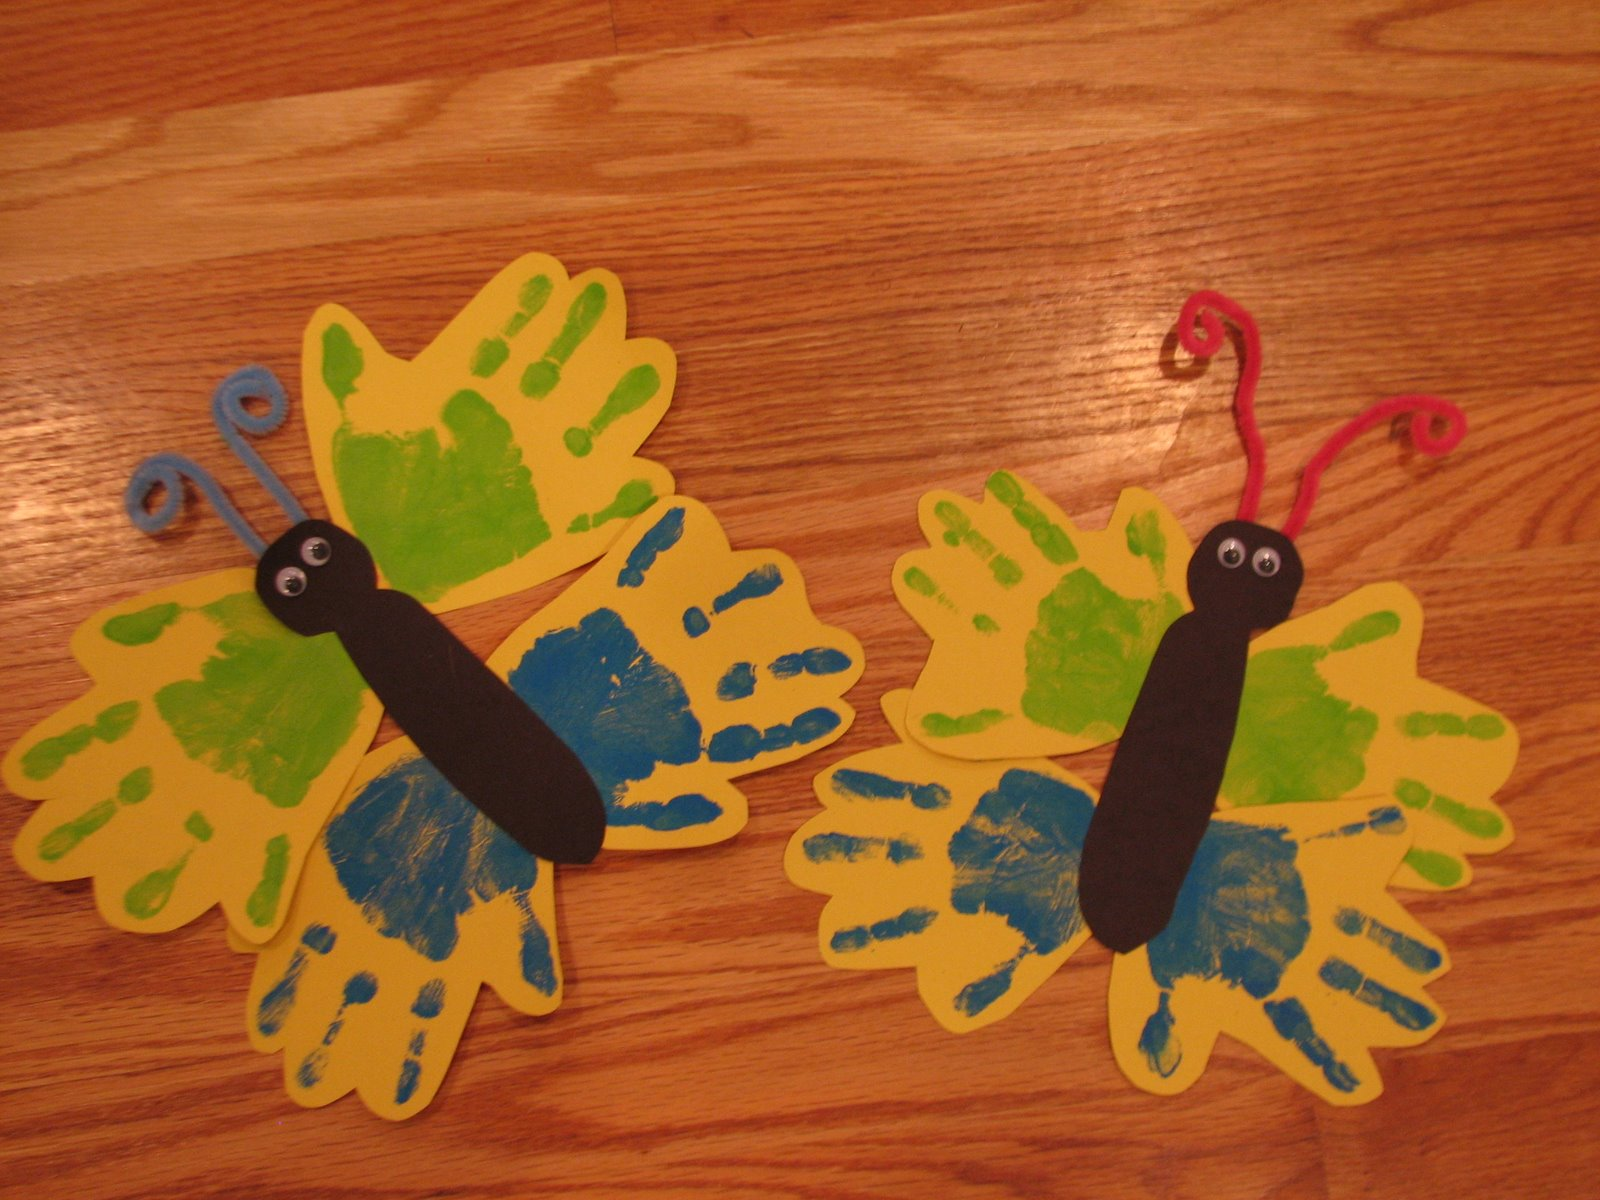 4th Grade Christmas Craft Ideas - Craft preschool art projects christmas craft ideas 4th grade